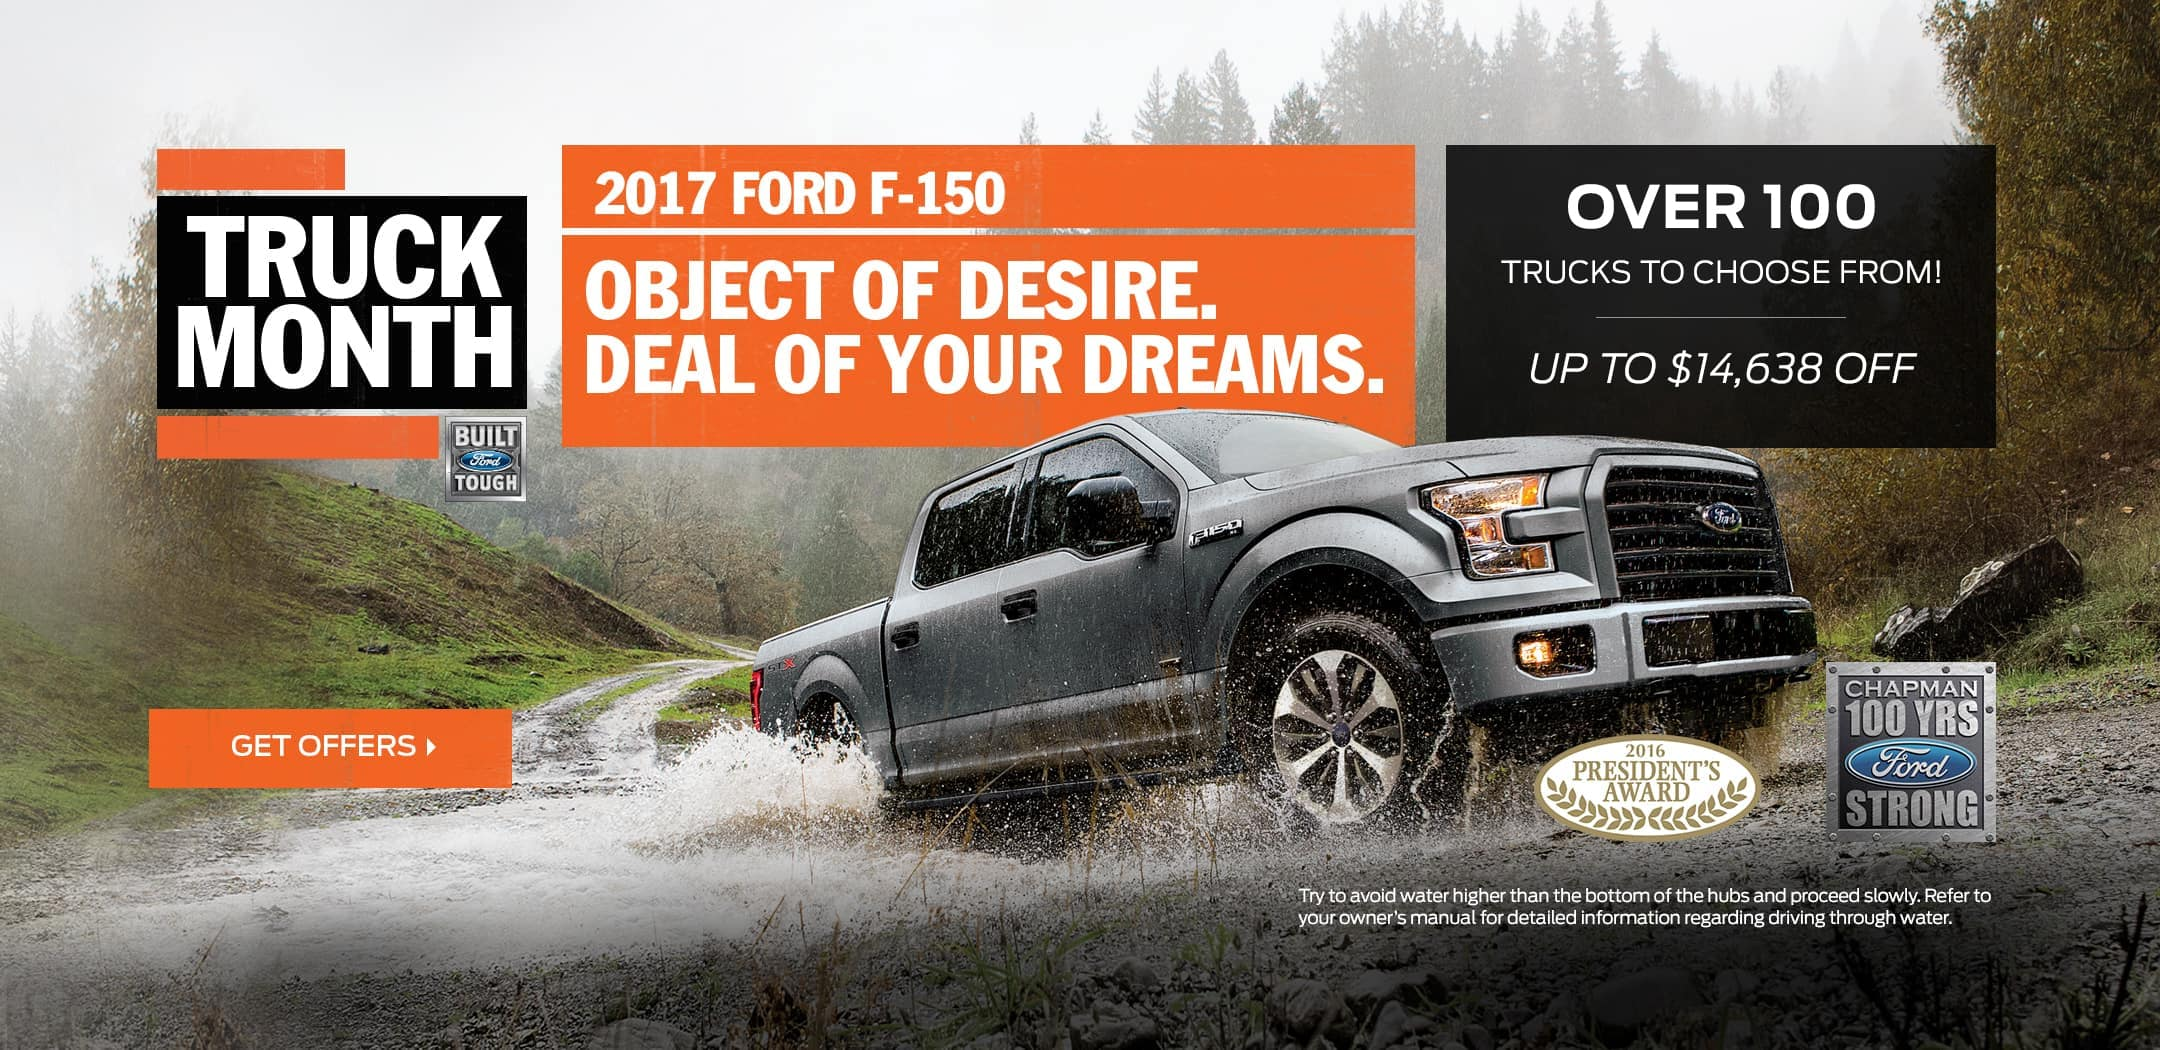 Columbus Area Ford Dealer | Bob Chapman Ford Inc. | Marysville OH | New Ford u0026 Used Cars | Auto Body Repair & Columbus Area Ford Dealer | Bob Chapman Ford Inc. | Marysville OH ... markmcfarlin.com